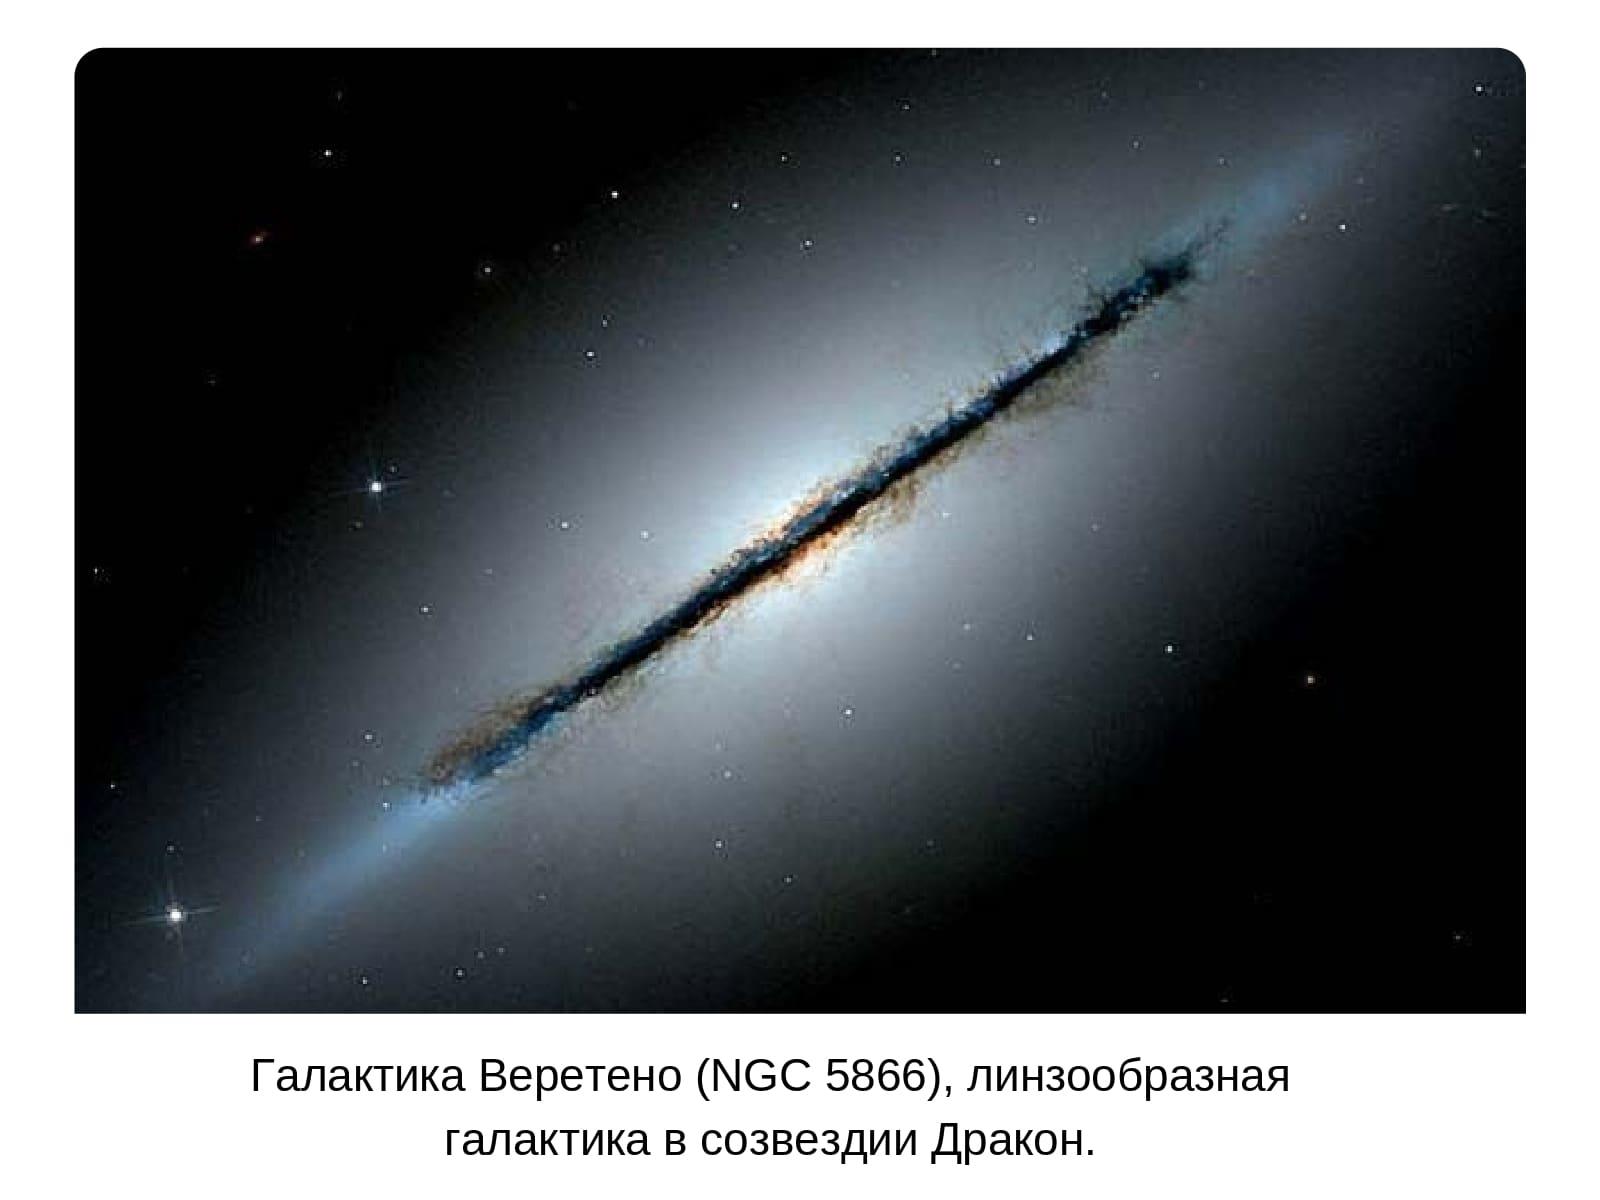 галактика Веретено